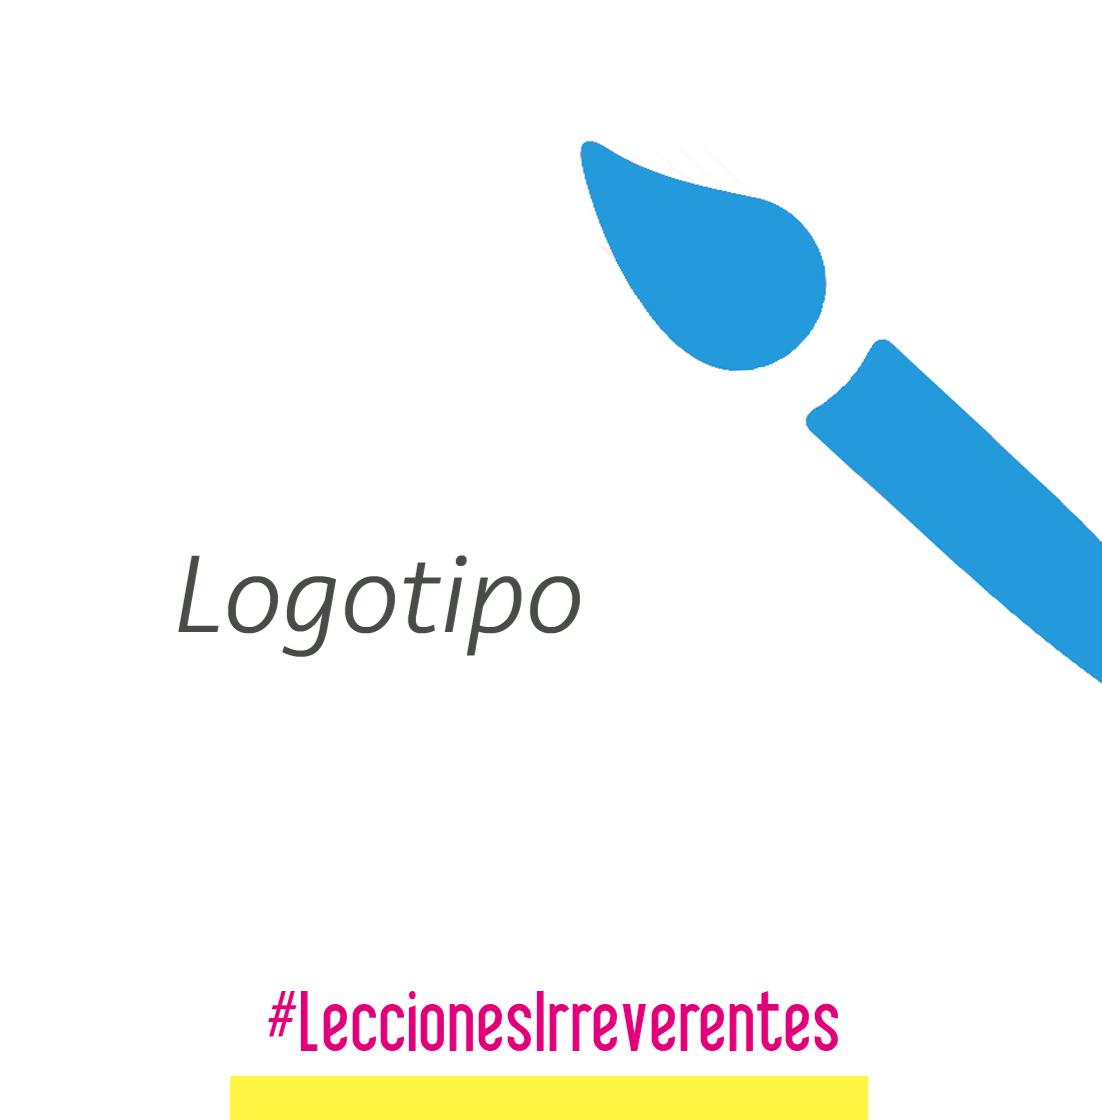 Lecciones Irreverentes - Logotipo